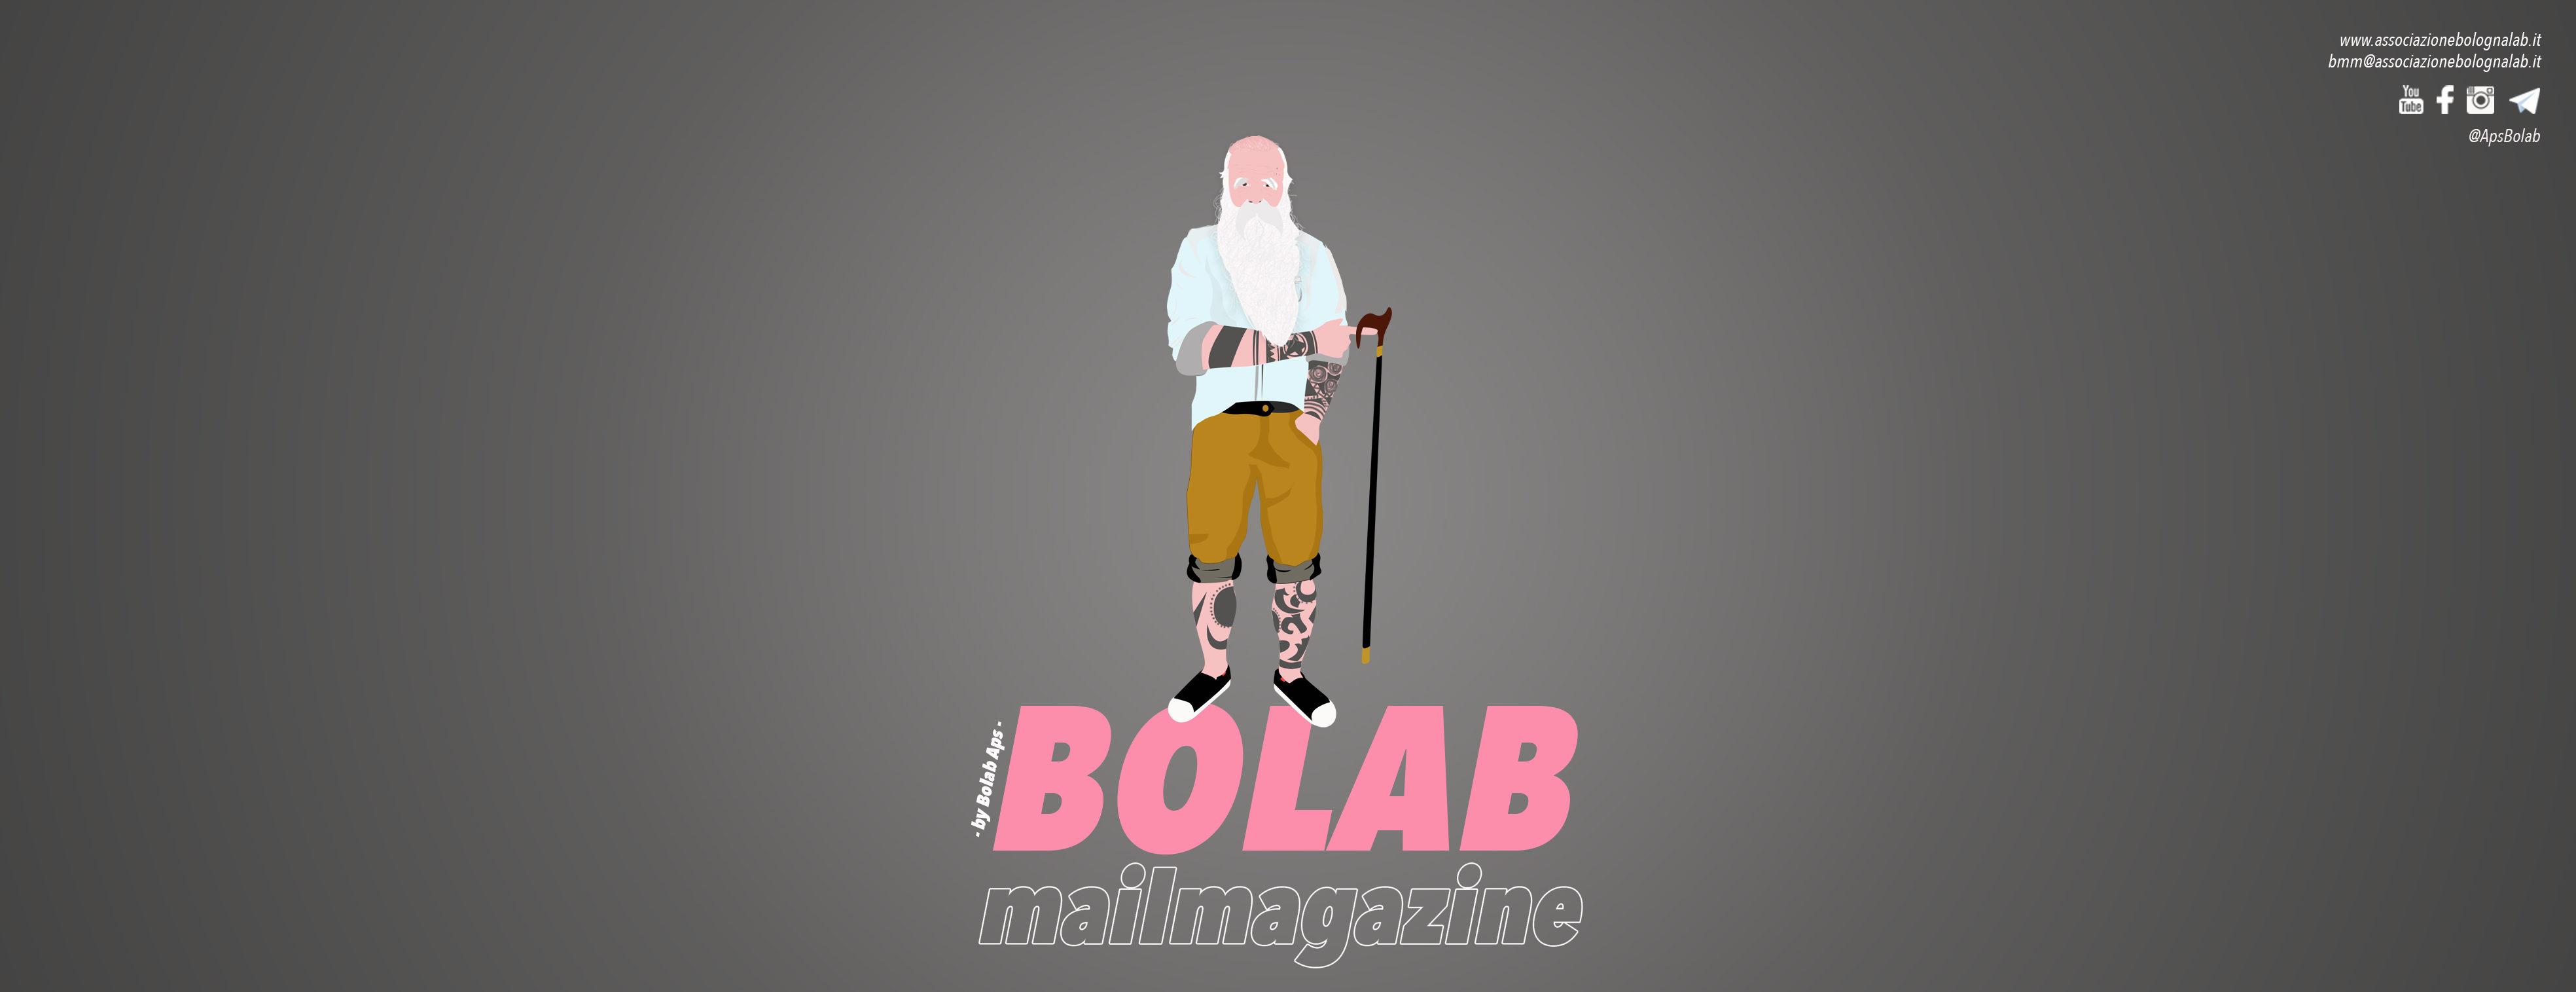 Bolab Mail Magazine